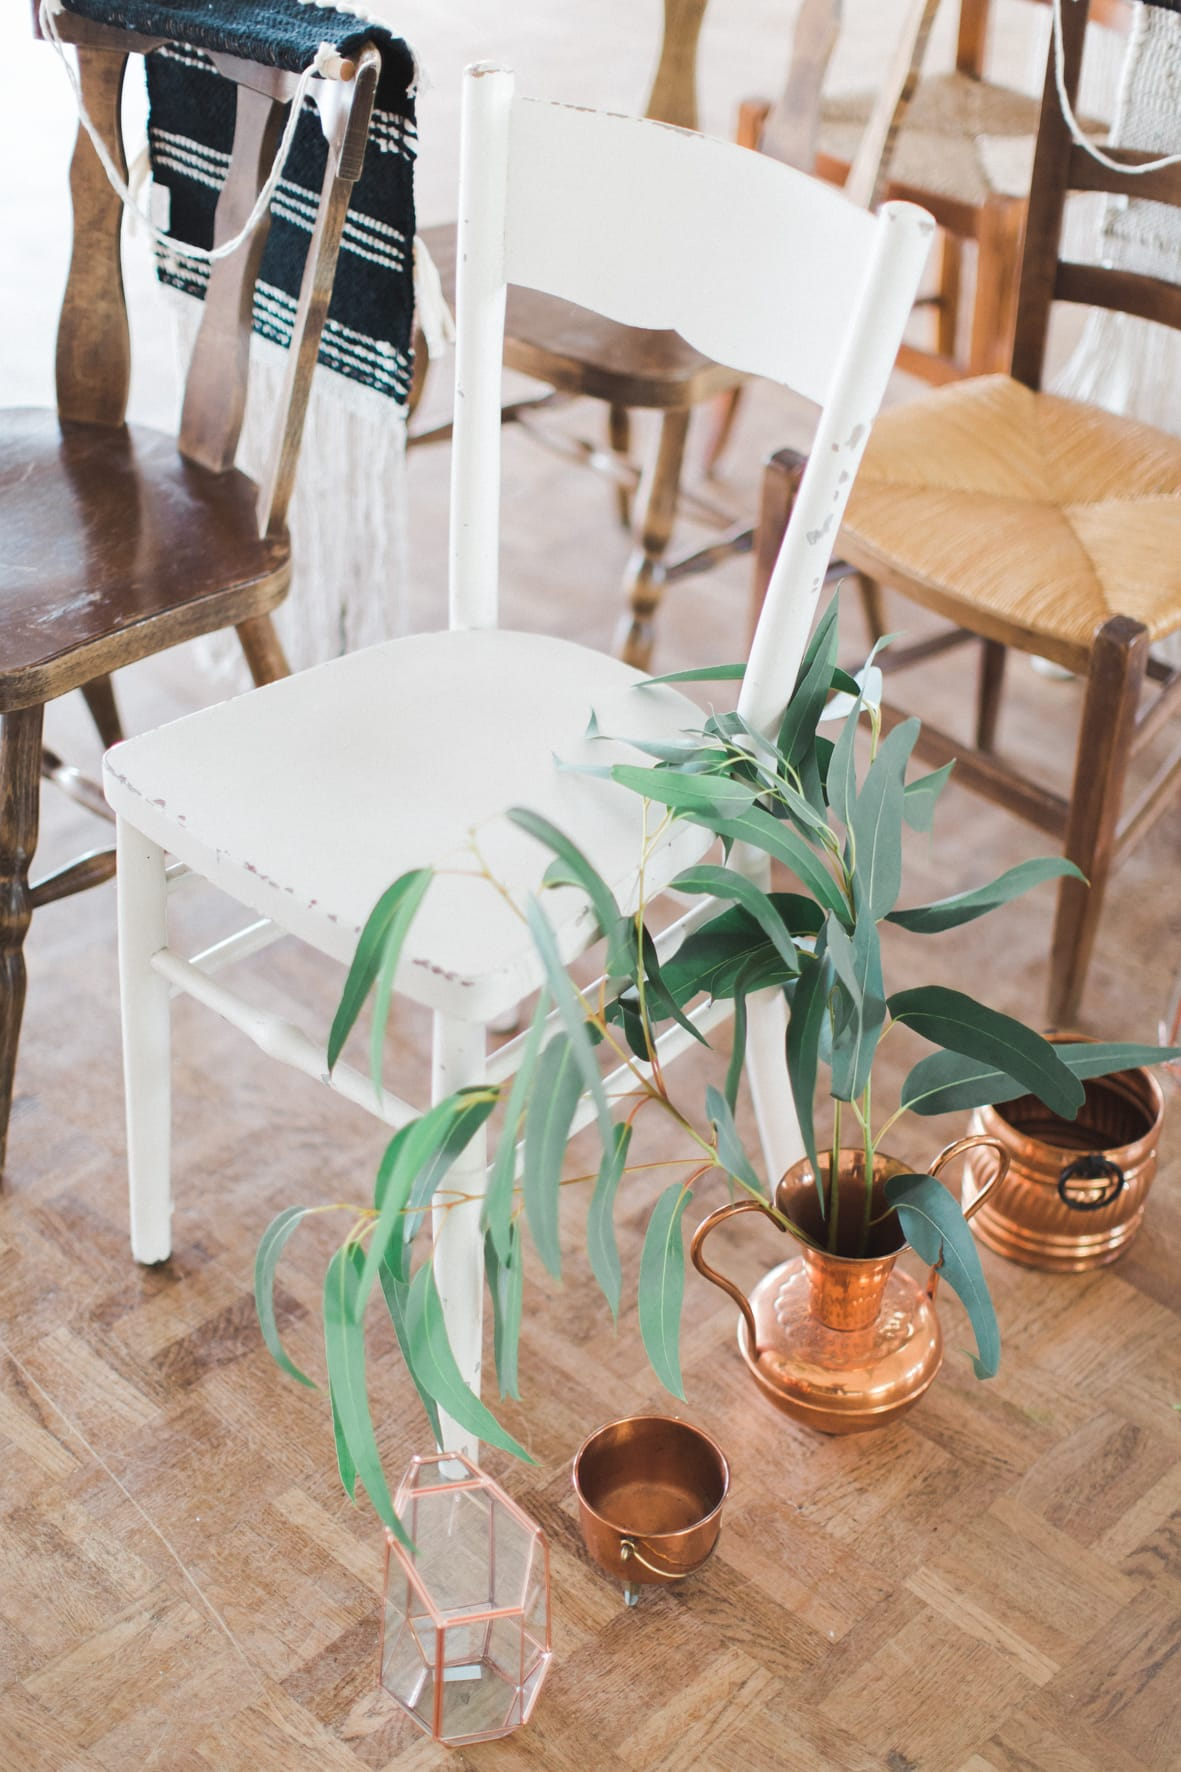 ObonheurDesDames-location-mobilier-mariage-nantes-167